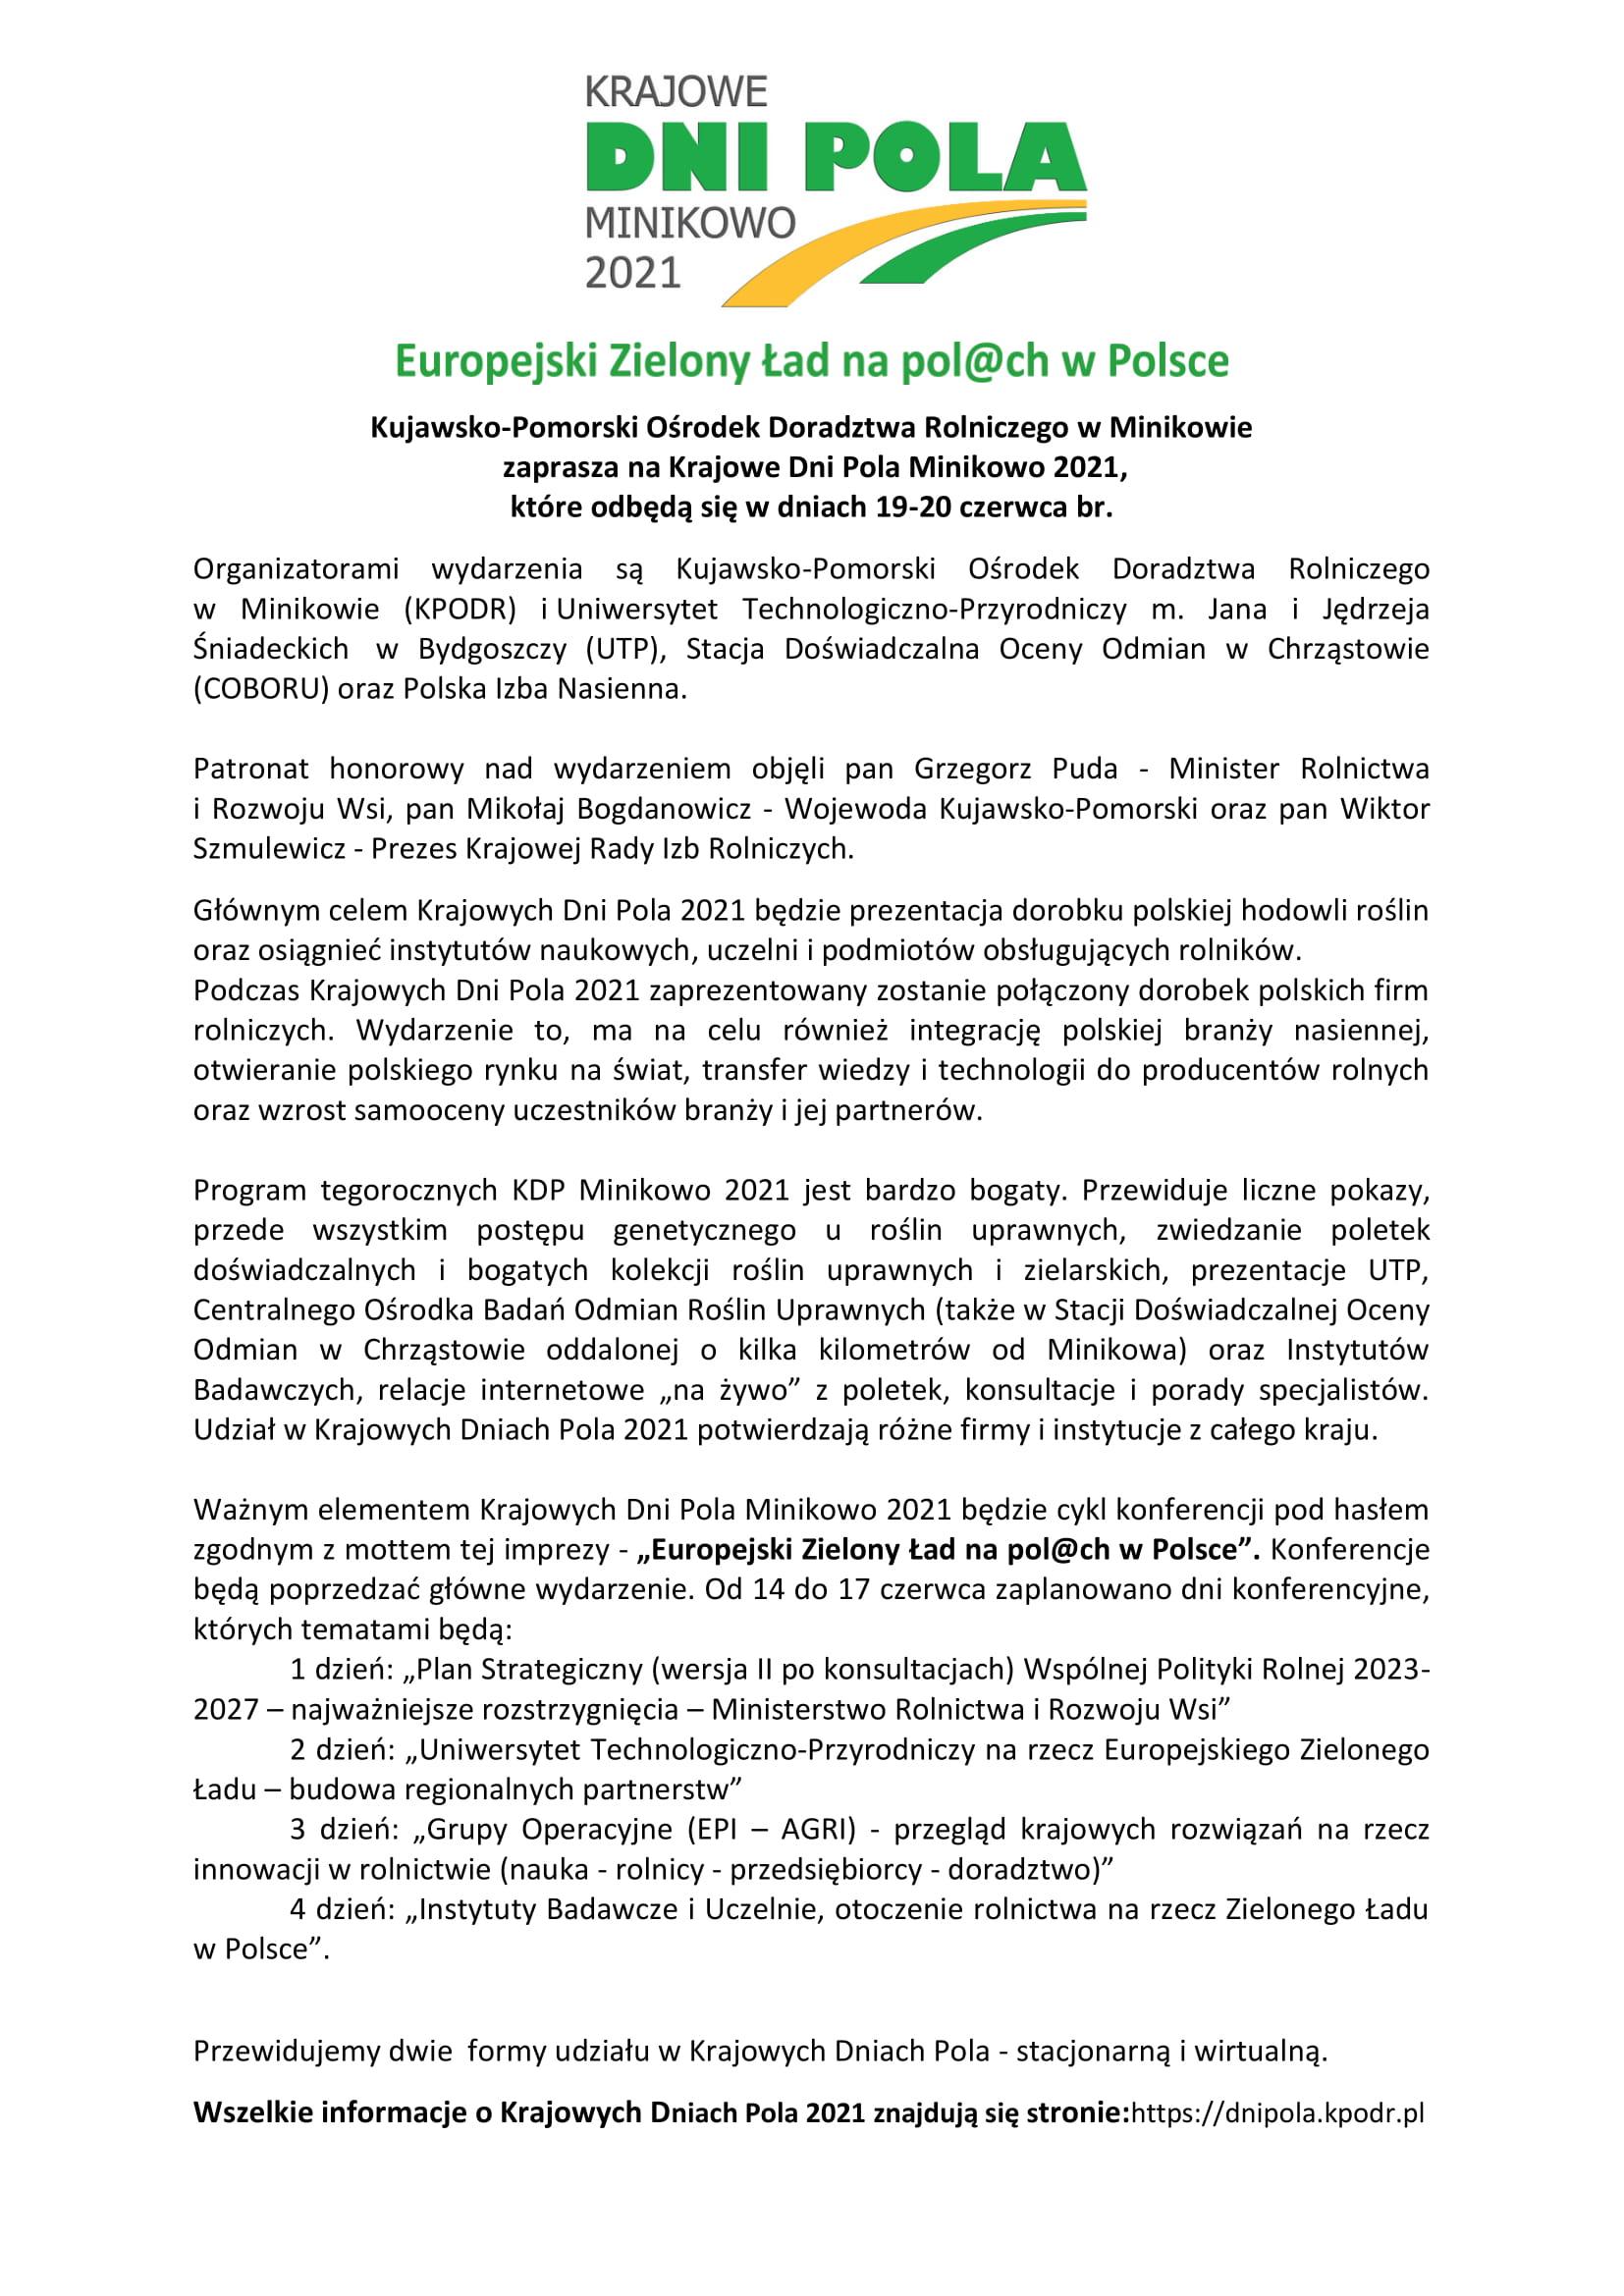 Informacja o KDP-1.jpg (388 KB)